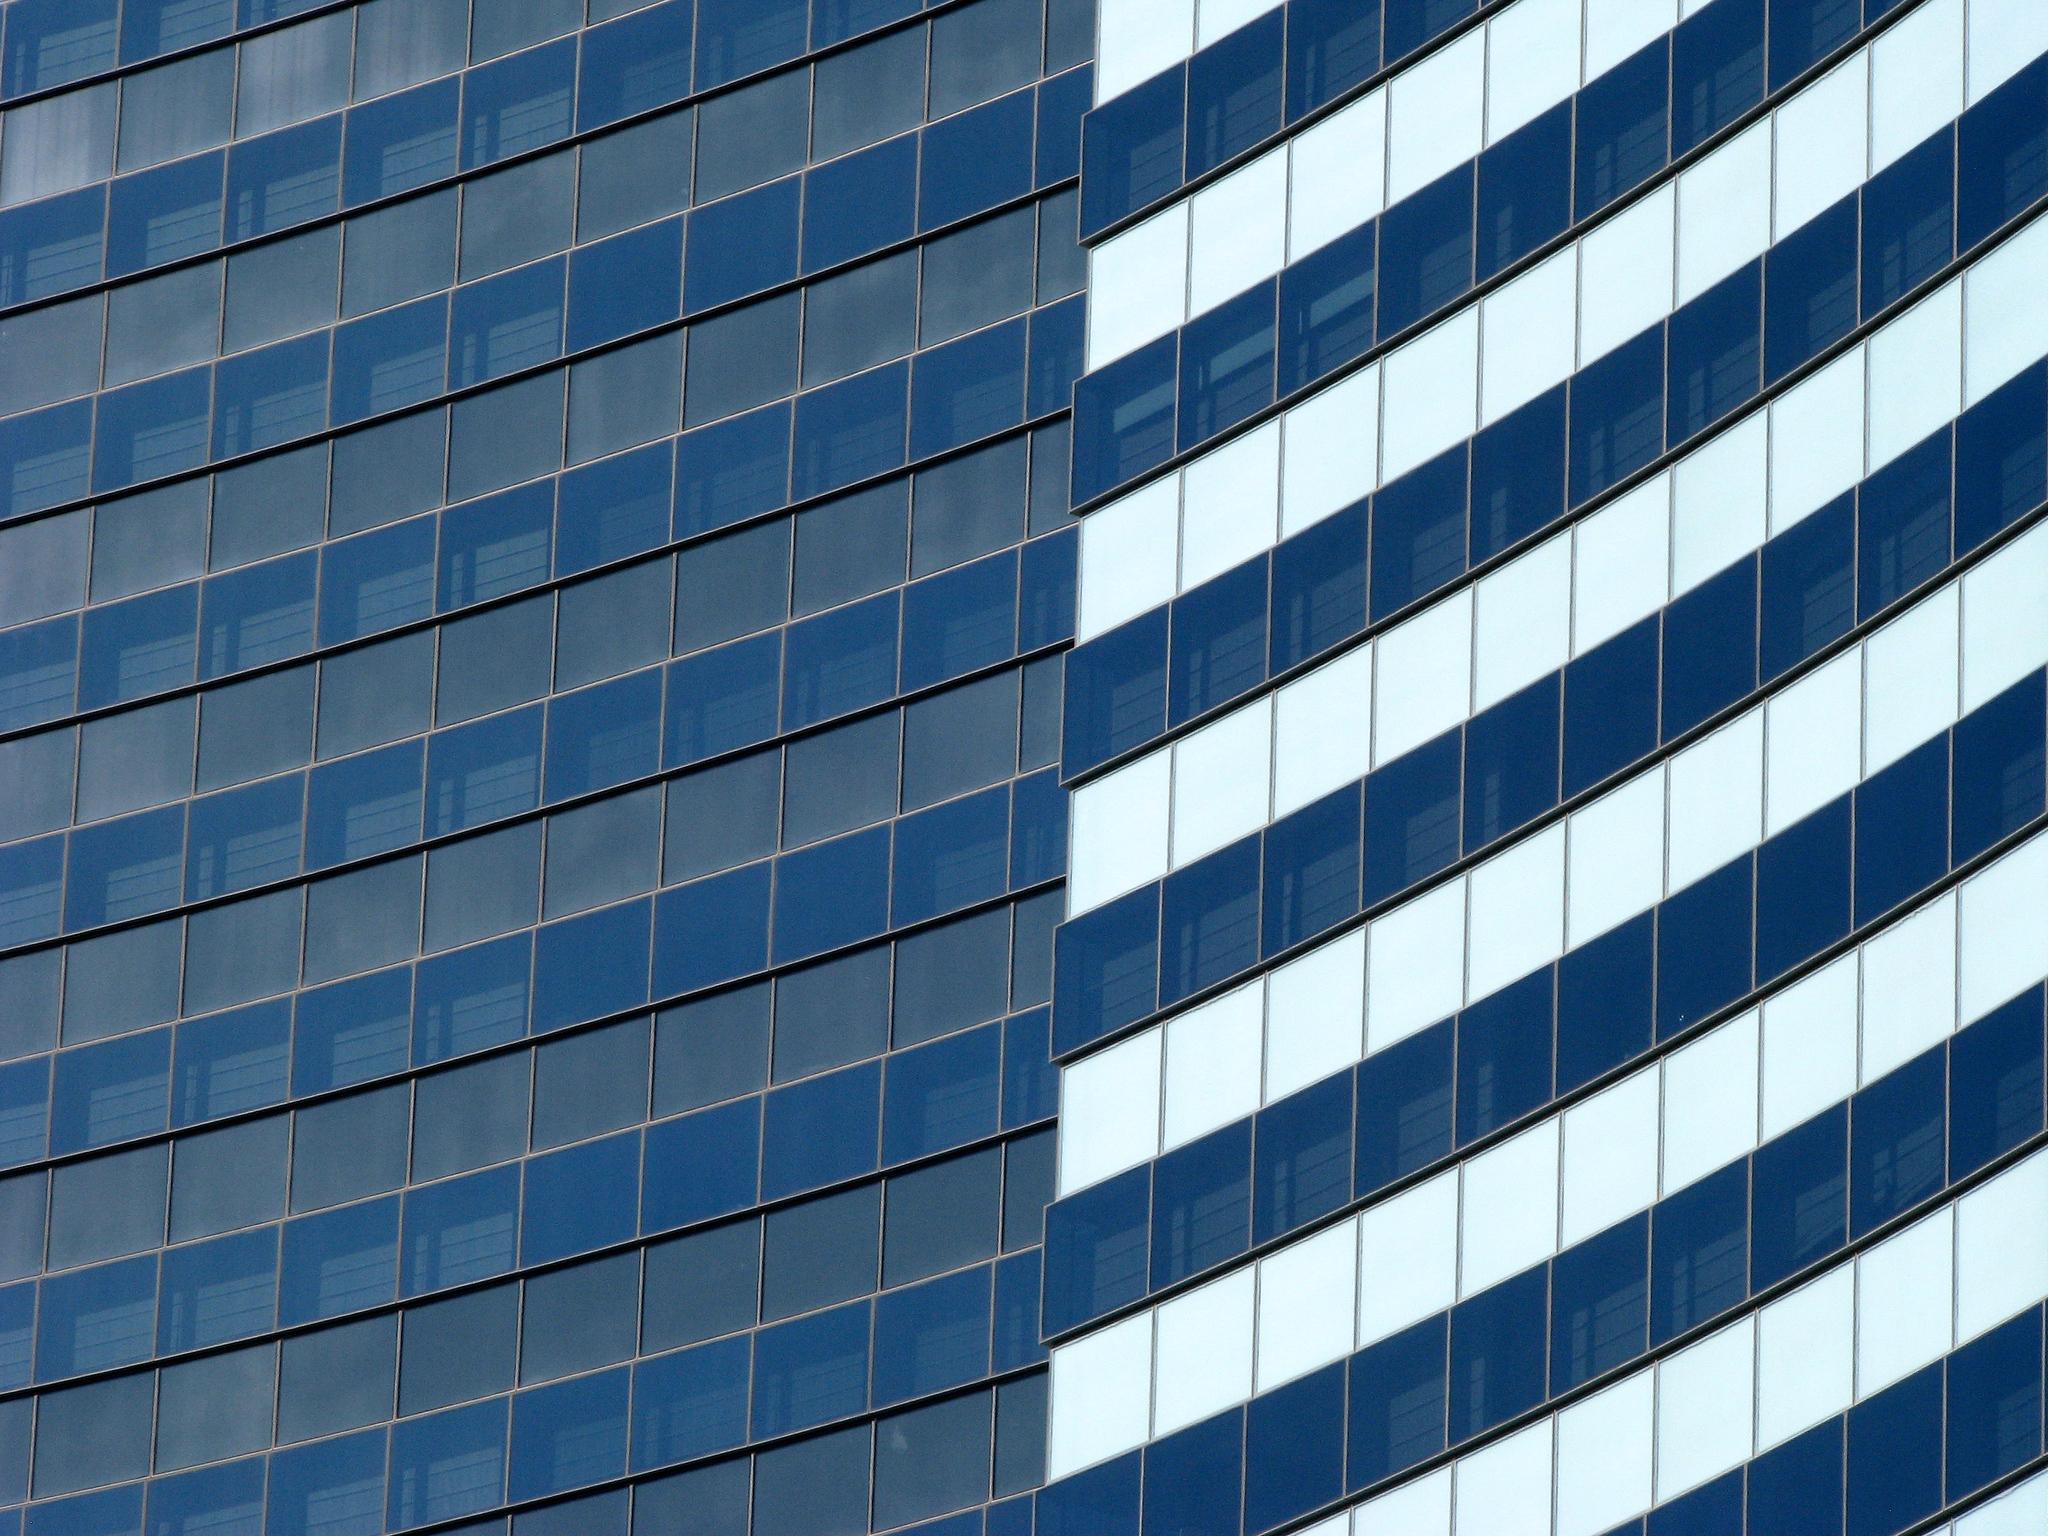 Patterns of windows